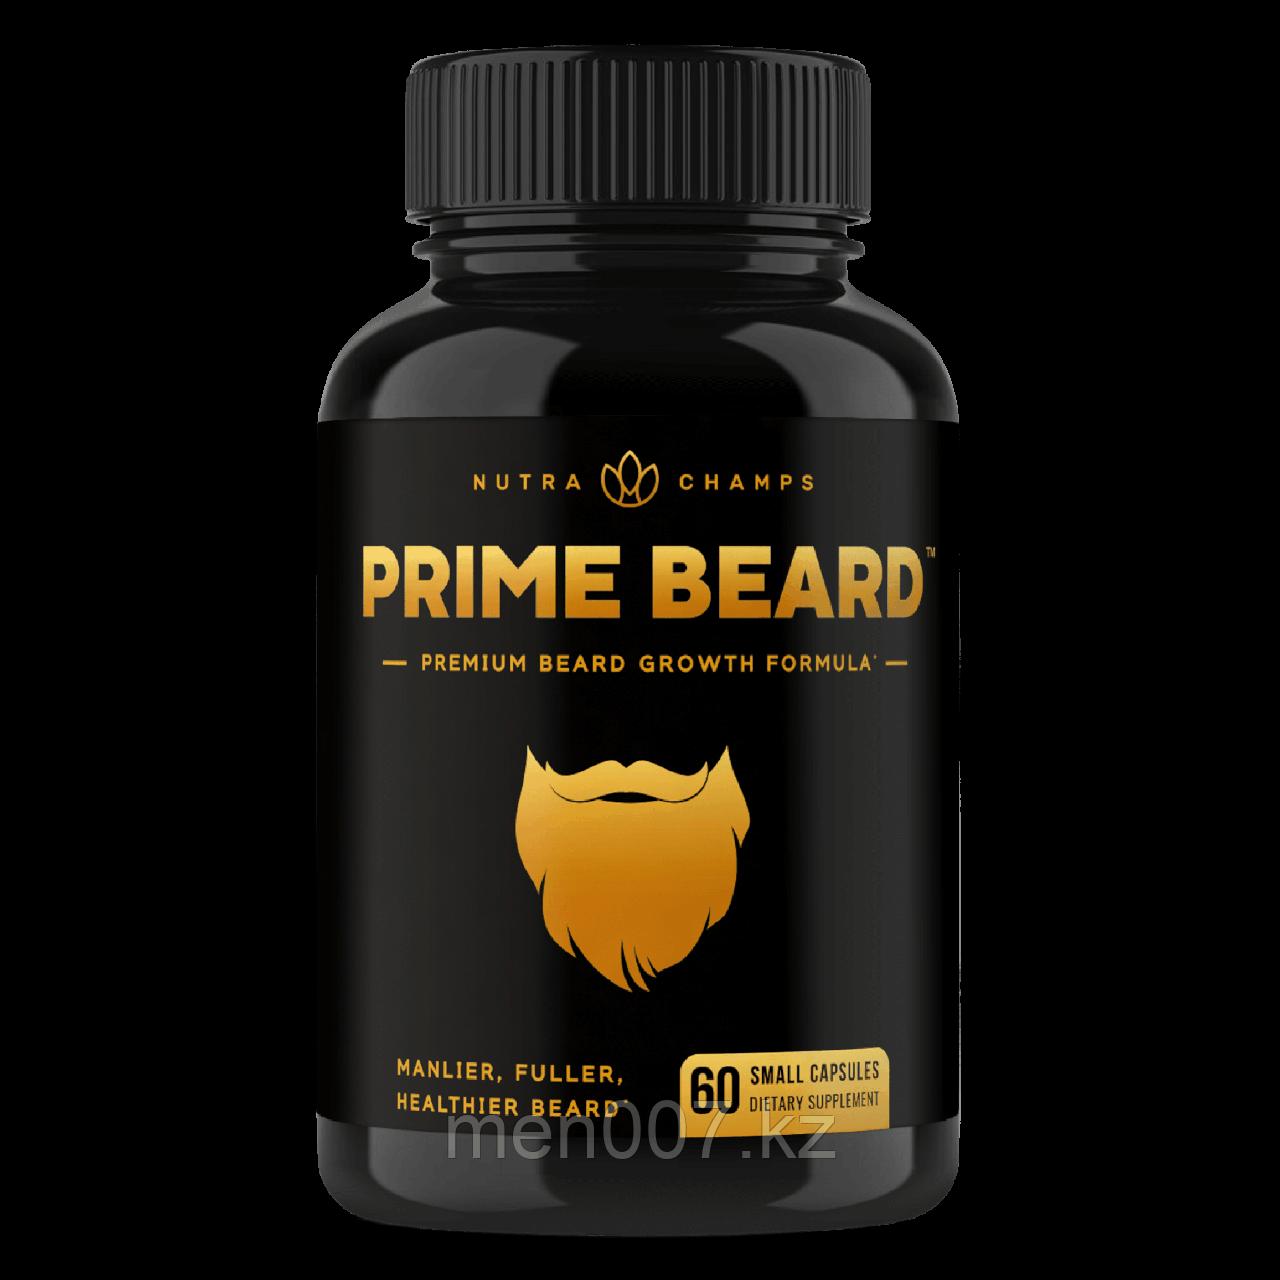 БАД Prime Beard витамины для роста бороды, США (60 таблеток)